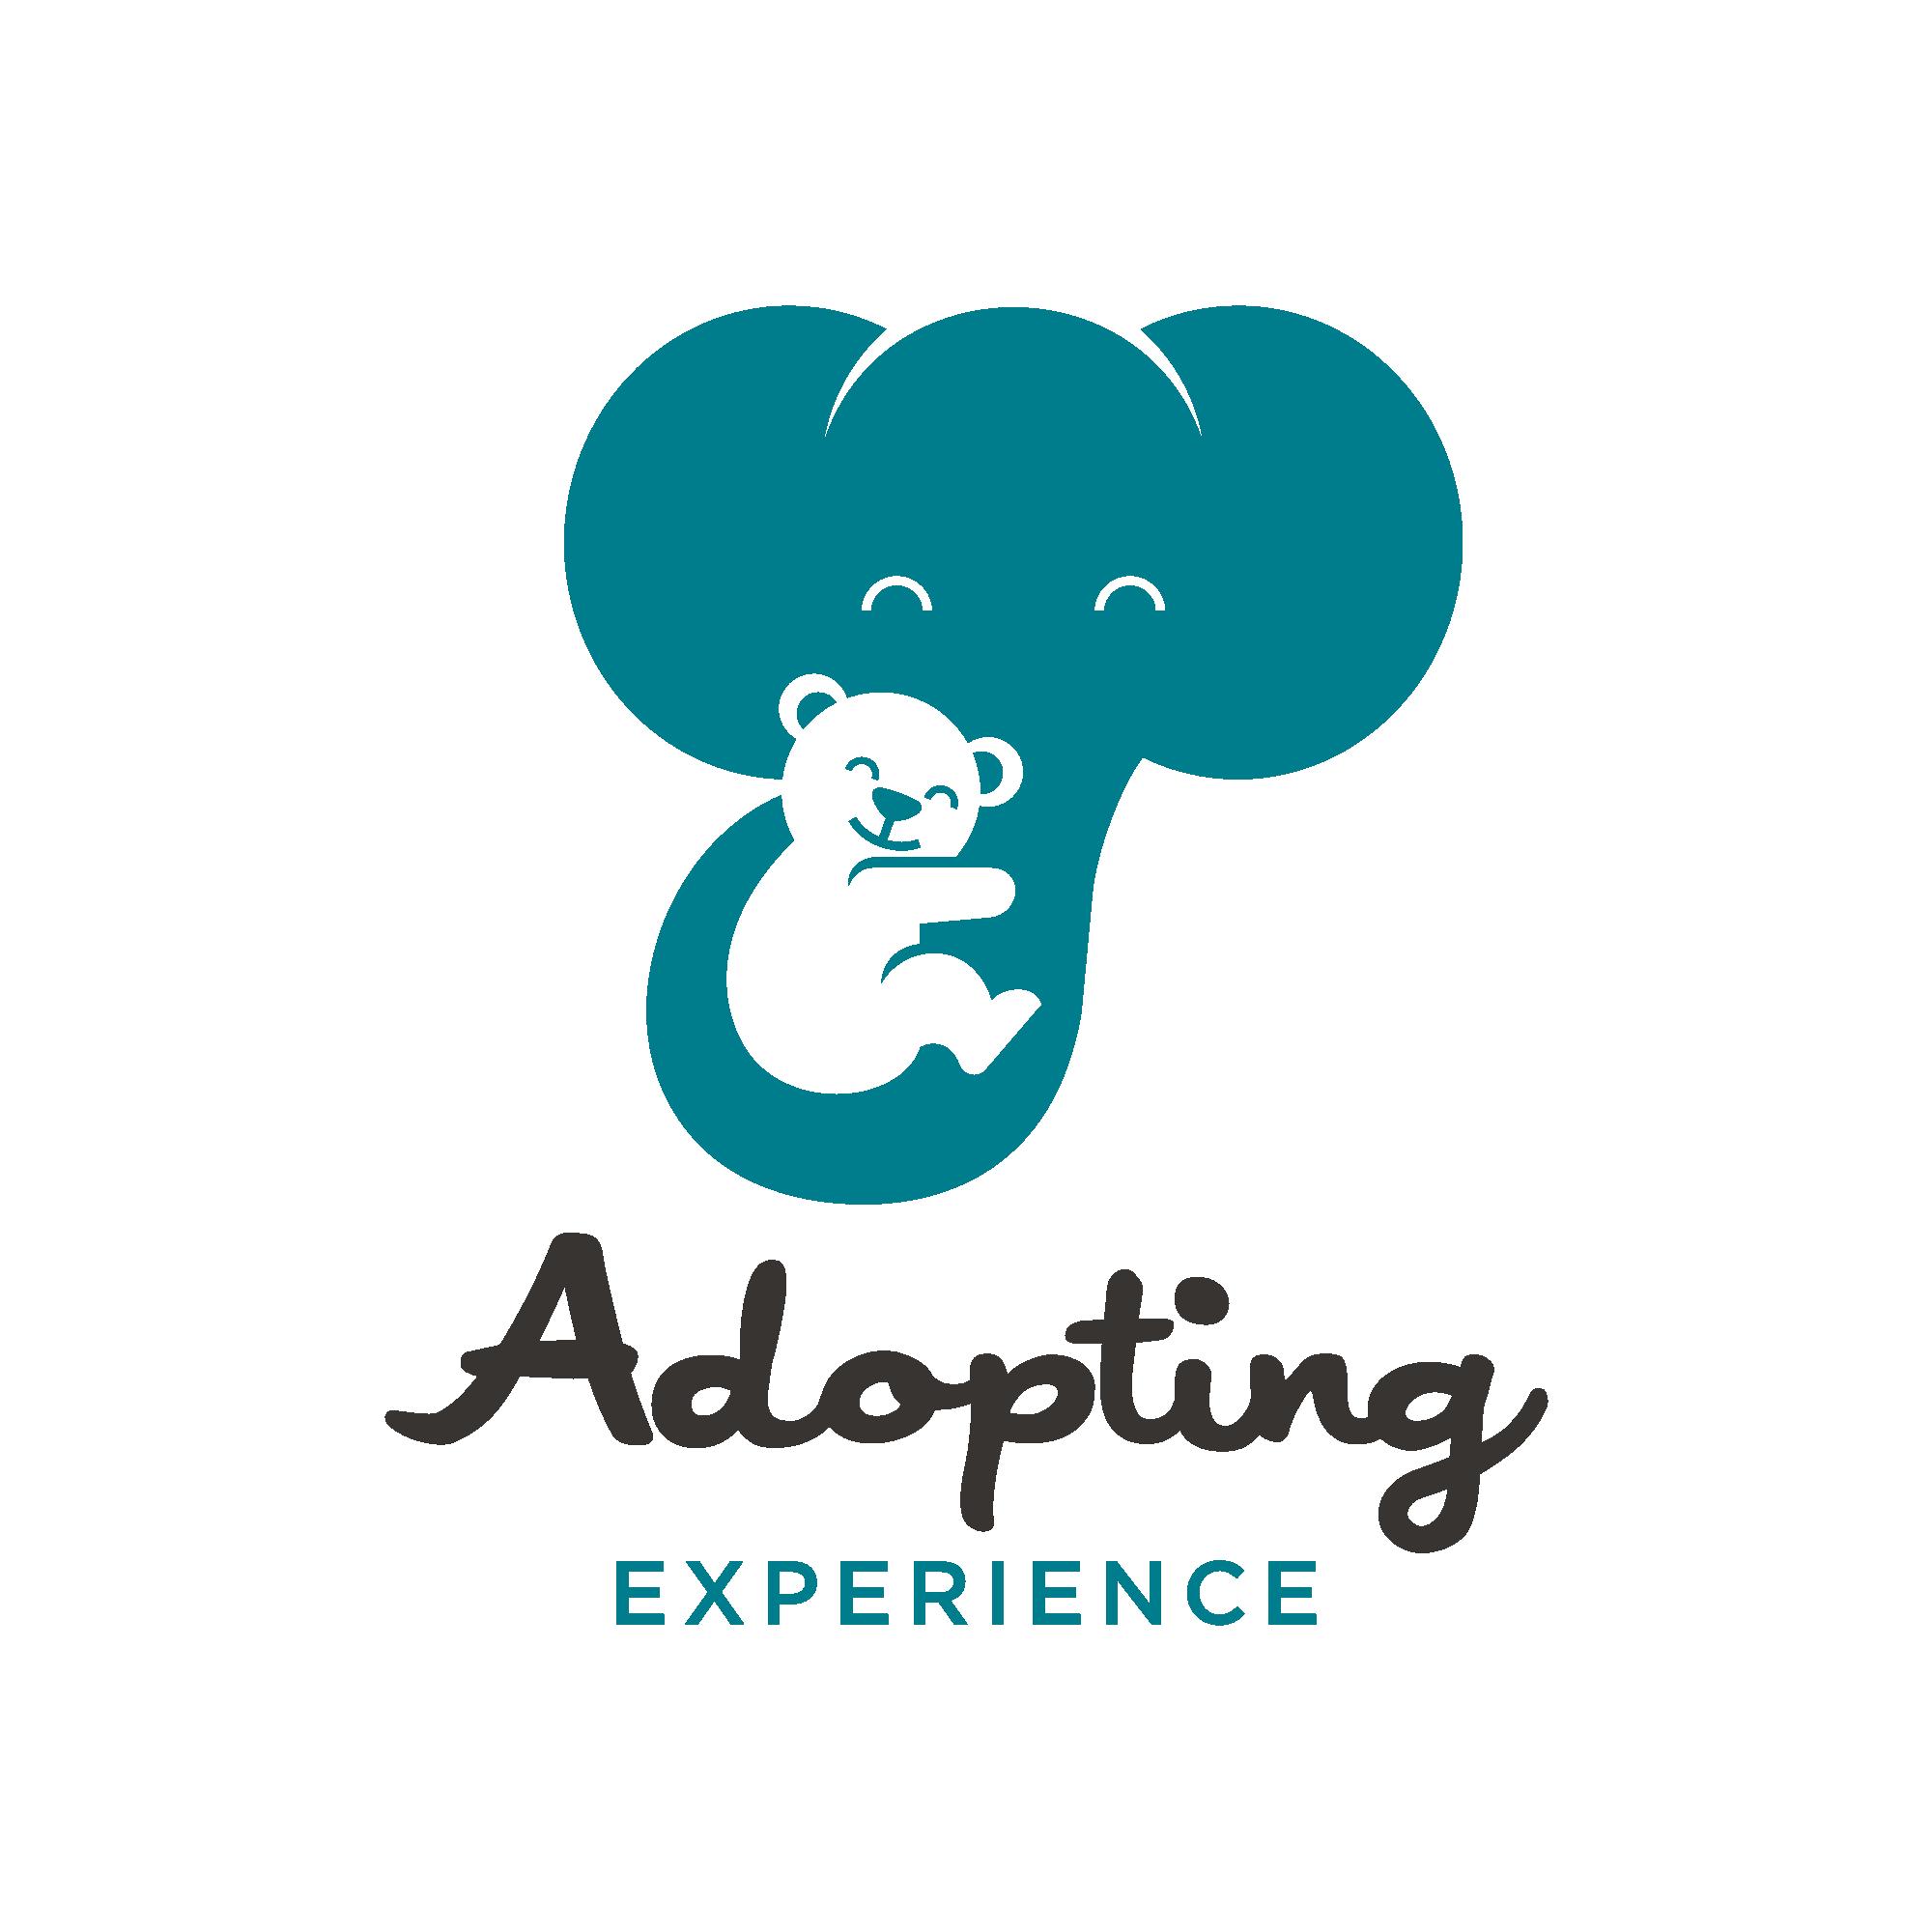 Adopting Experience seeking a stunning logo for brand launch